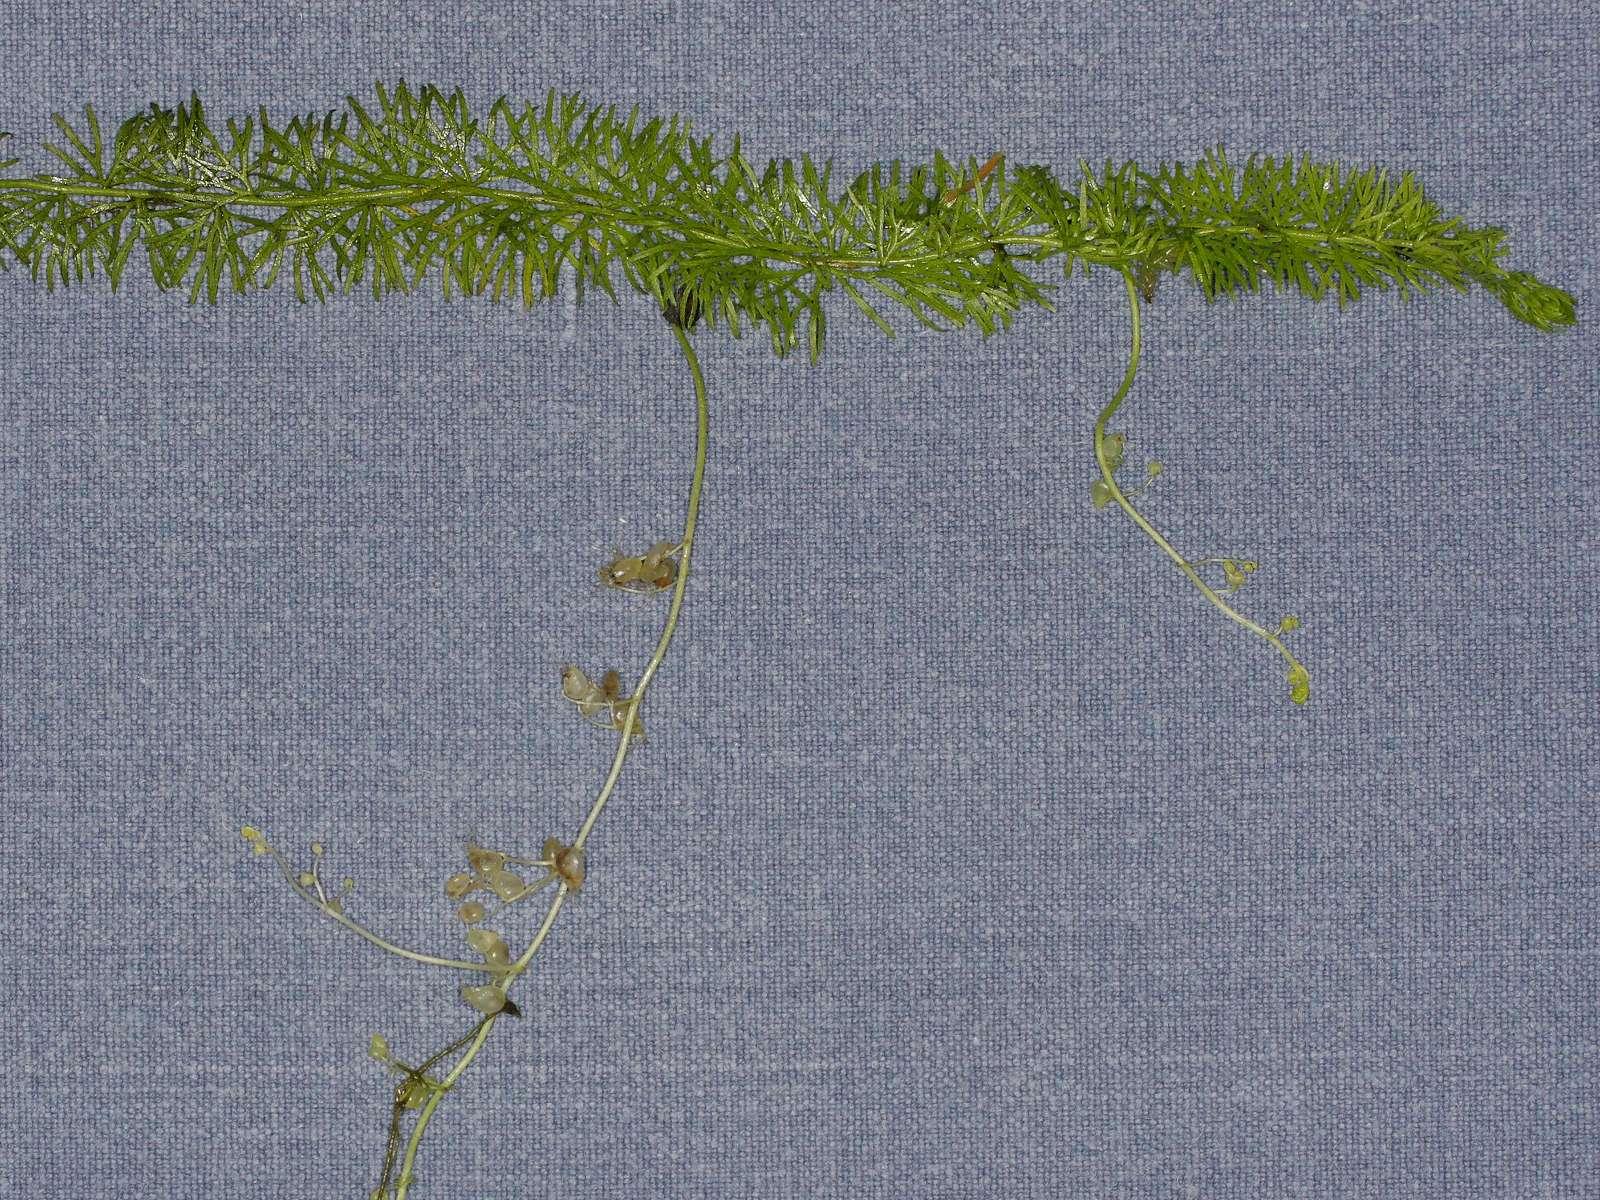 Utricularia intermedia  Mittlerer Wasserschlauch Utricularia Intermedia